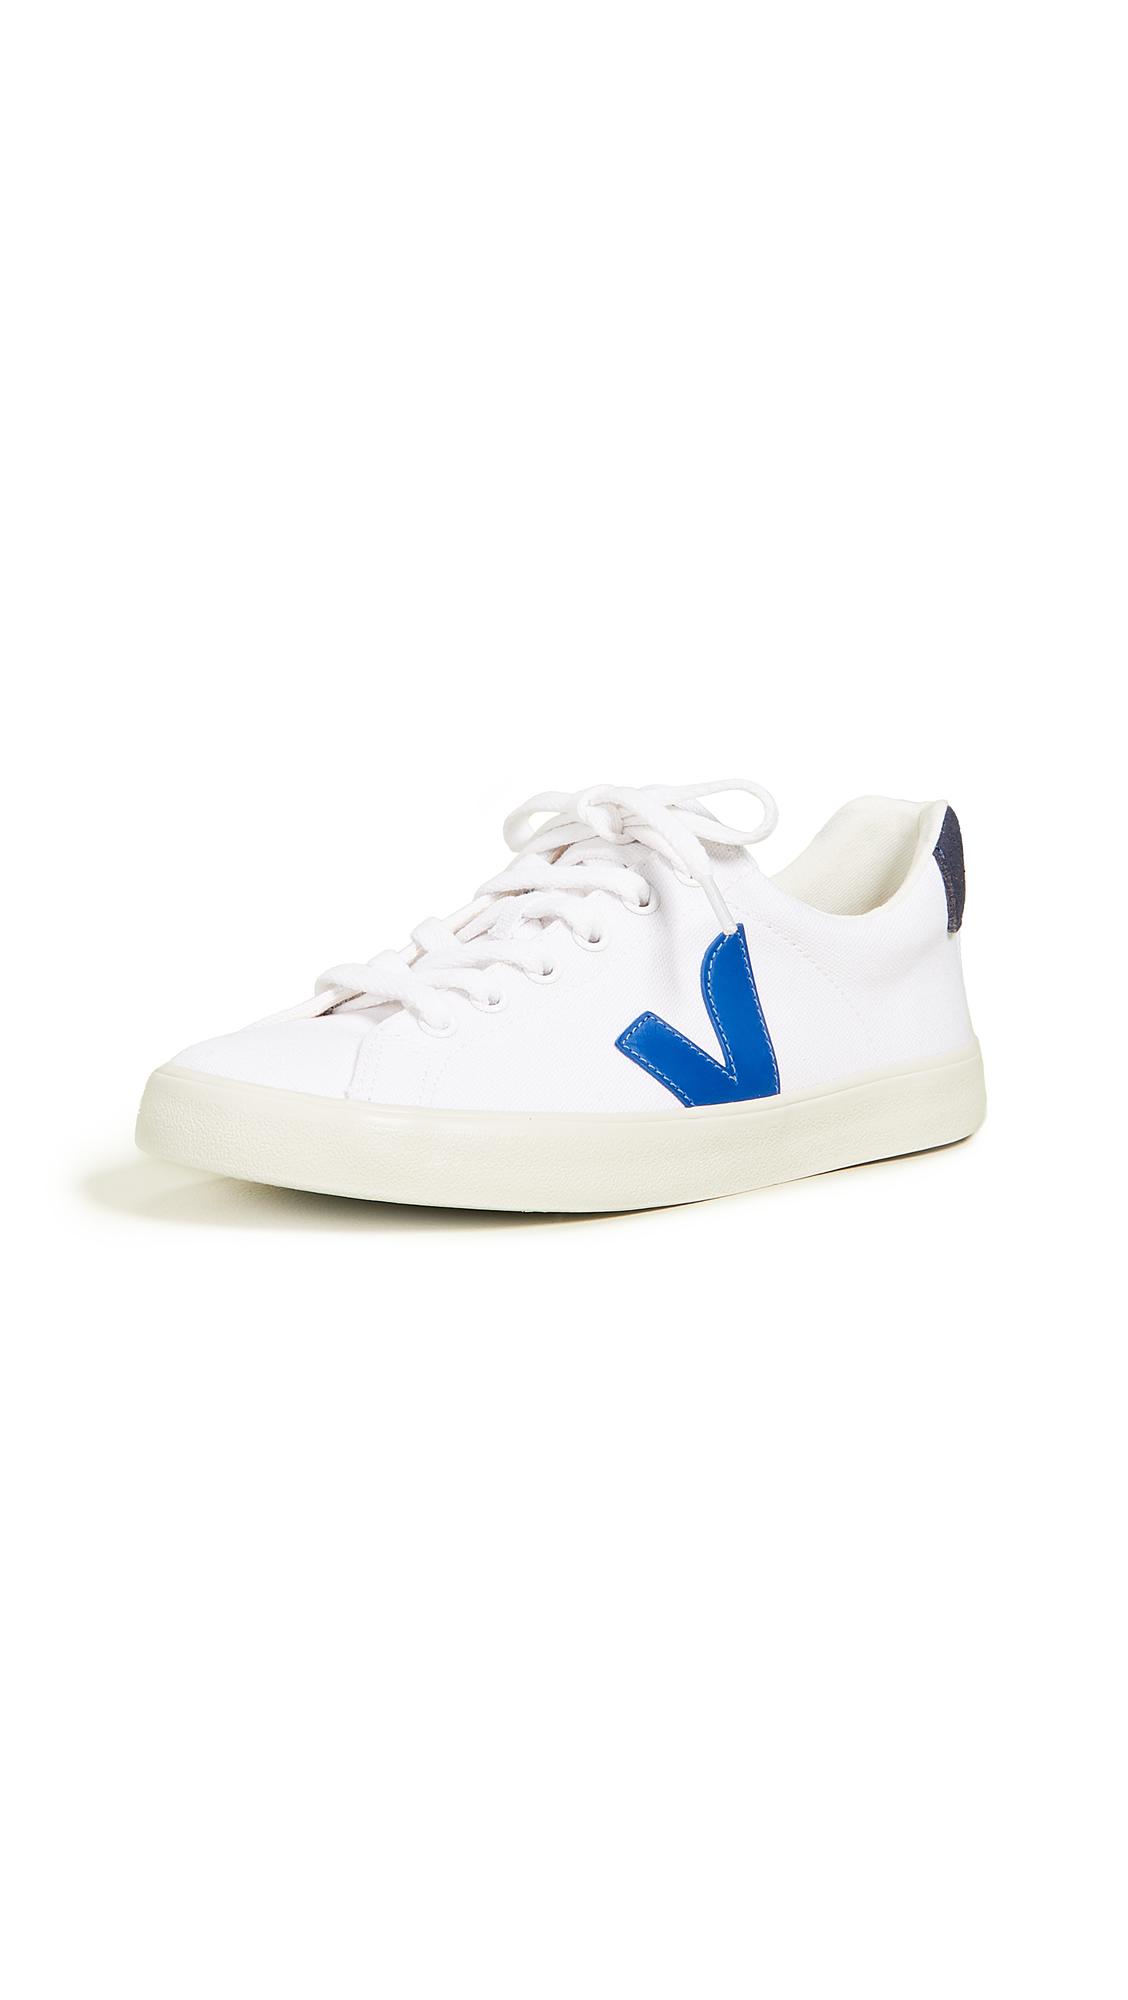 Veja Esplar Sneakers - White/Indigo/Nautico